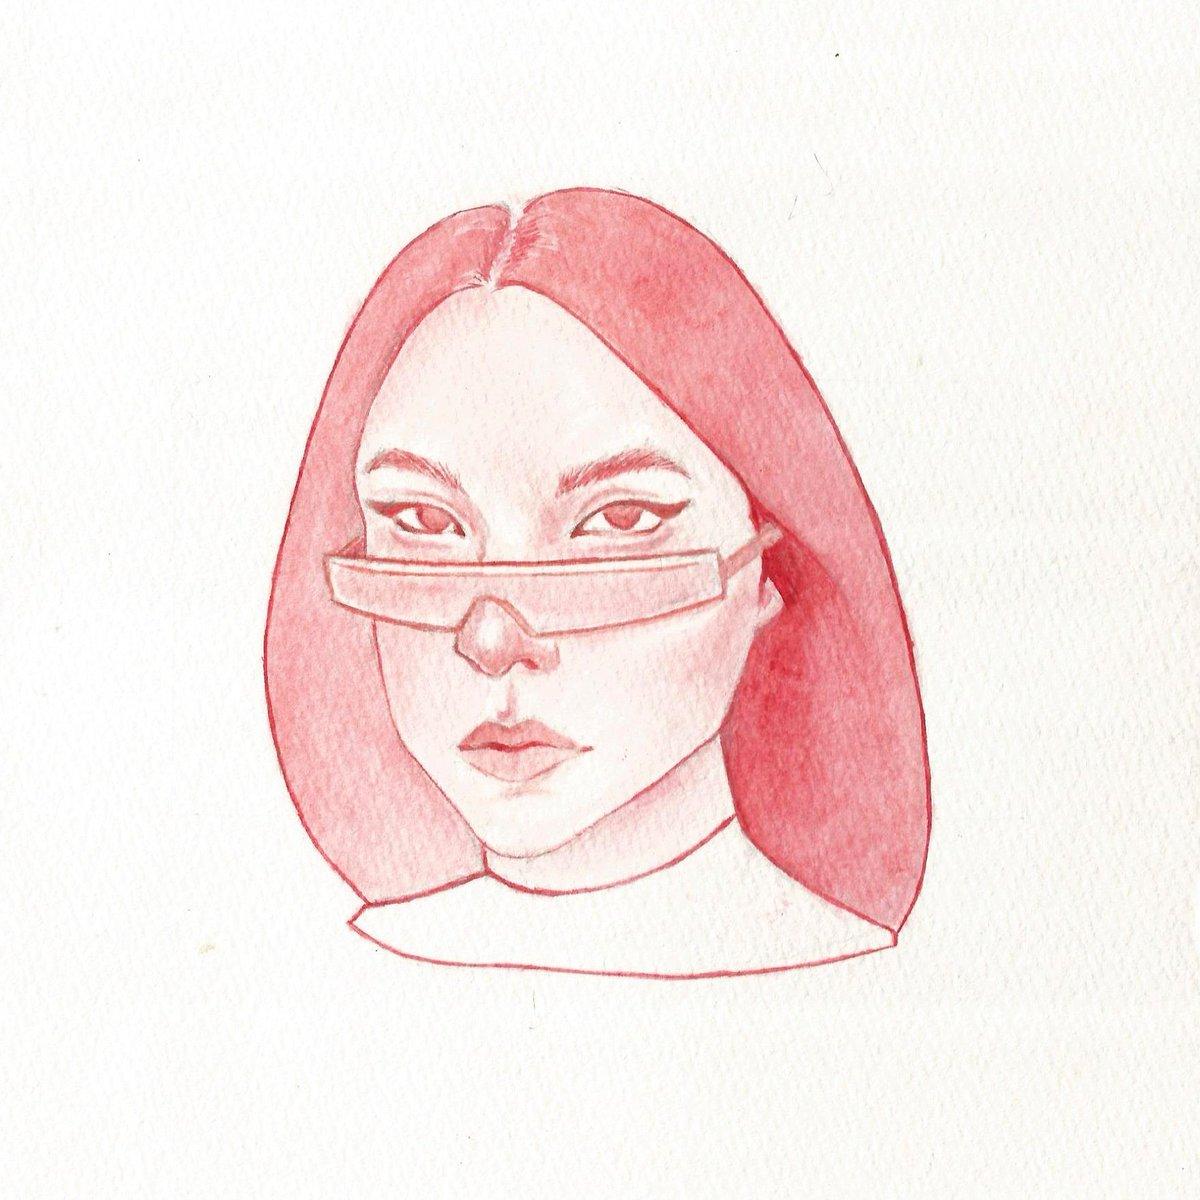 I drew my queen Yumi Nootenboom  #watercolorpainting #portraits #yuminootenboompic.twitter.com/8nrnLTGa0n